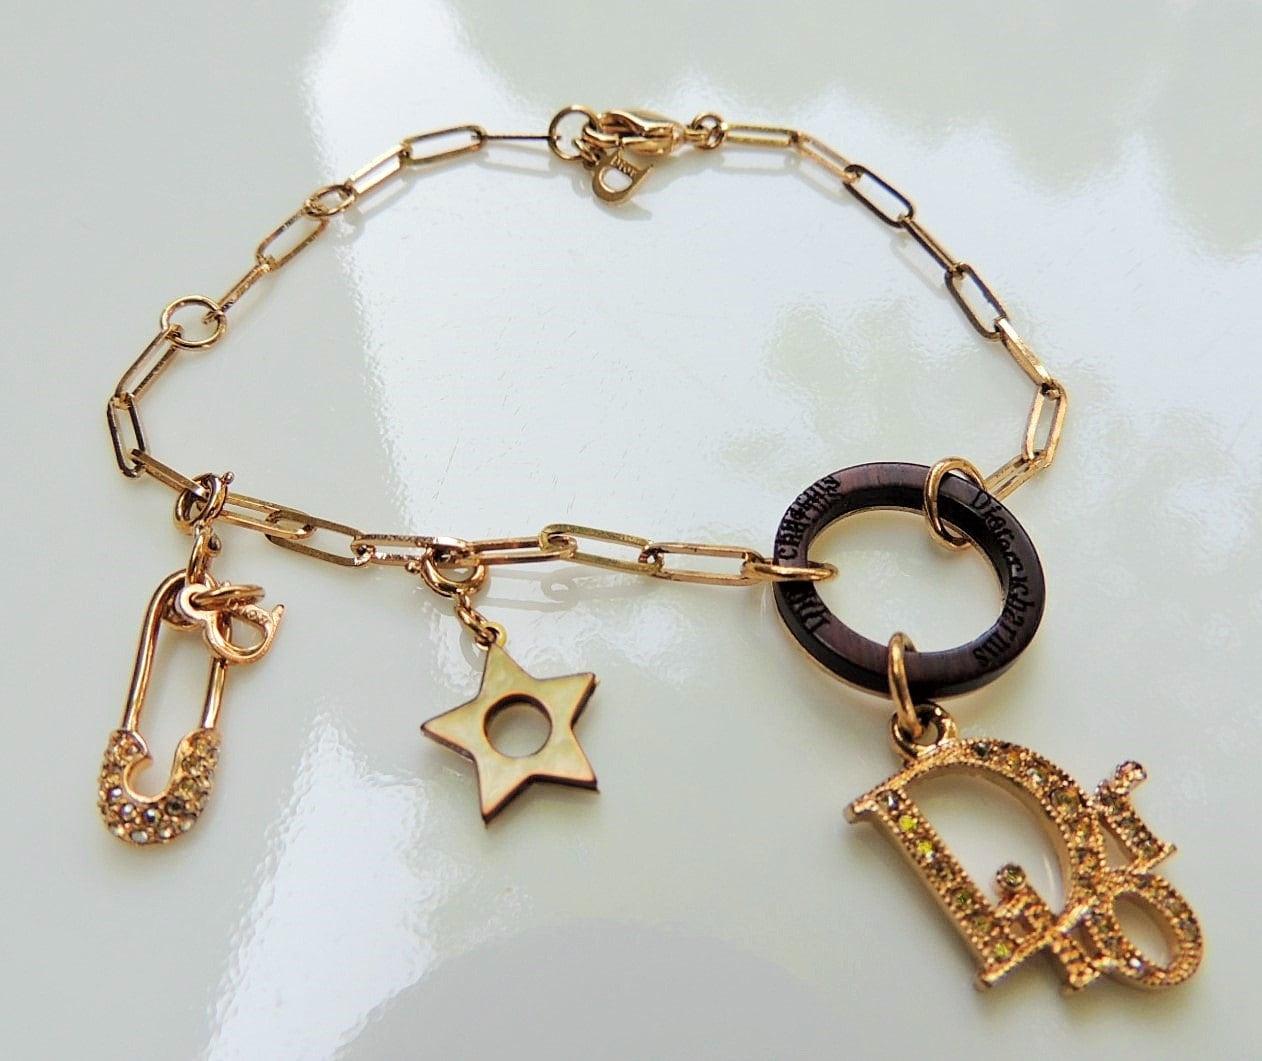 Christian Charm Bracelets: Vintage Christian Dior Charm Bracelet & Vintage Gucci Mini